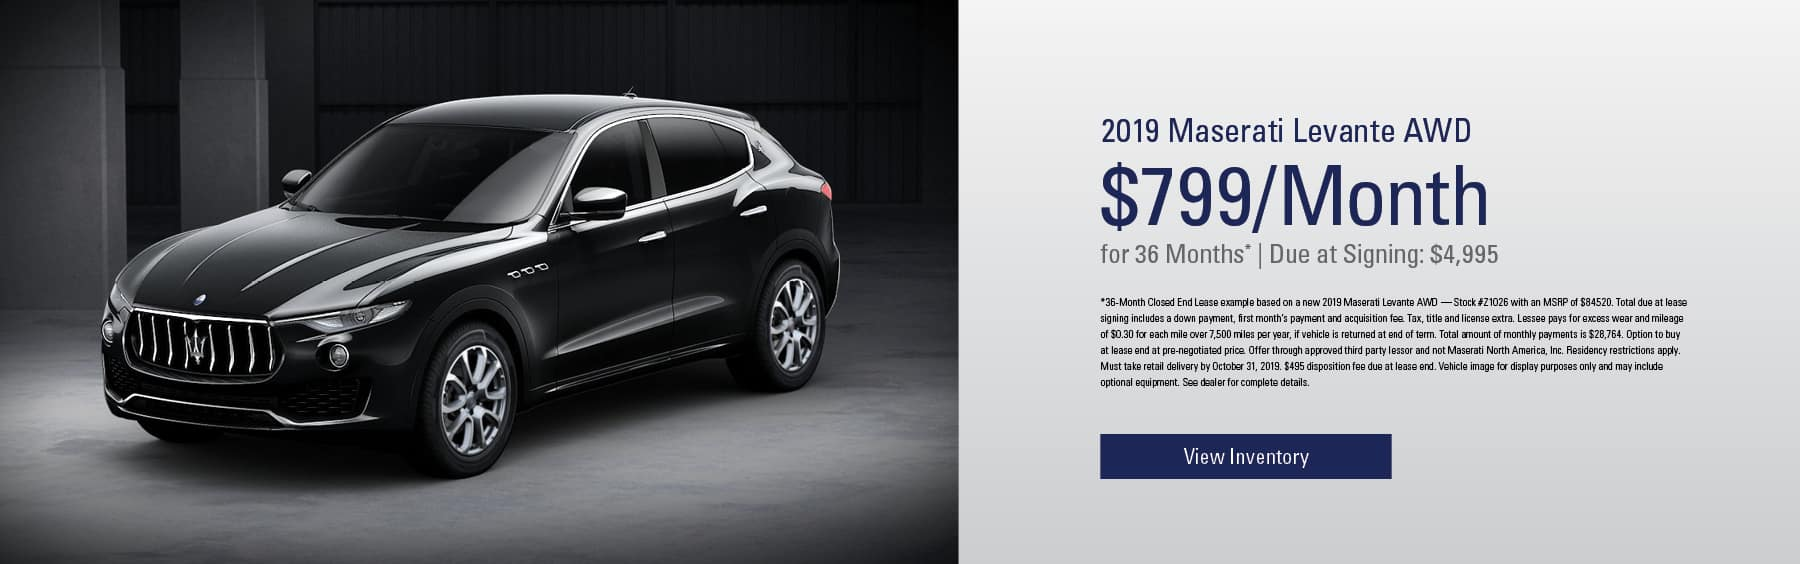 2019 Maserati 799/ 36 month for mobile